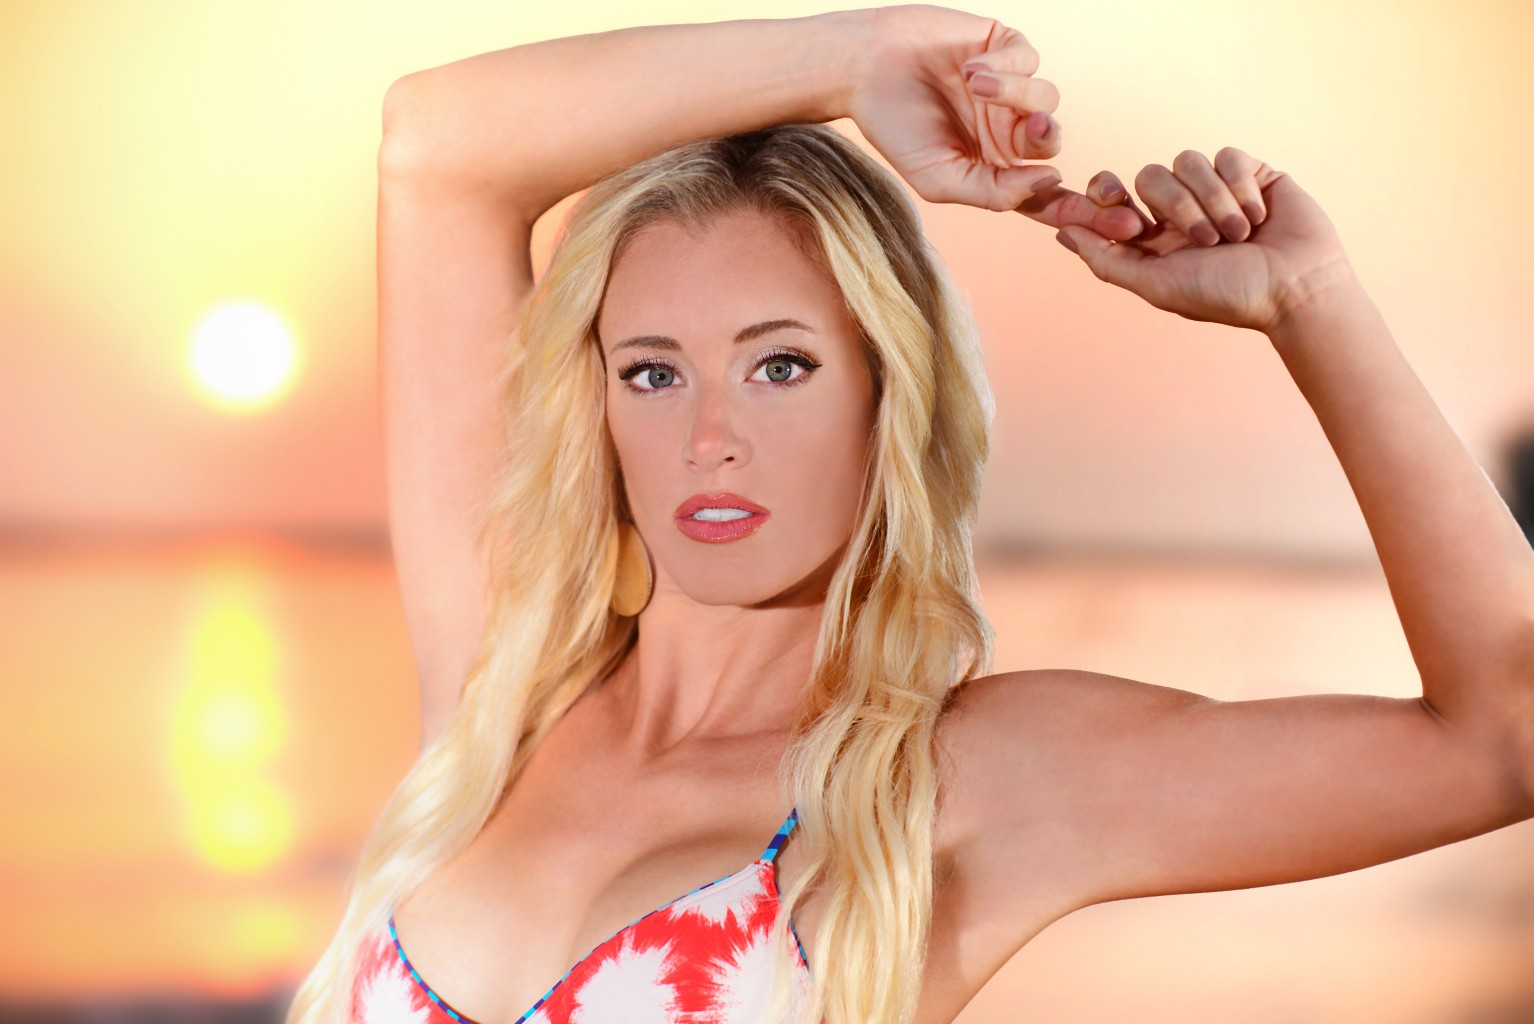 Shannon-Lee: Model & Mother to Seven Children Shares Her ...